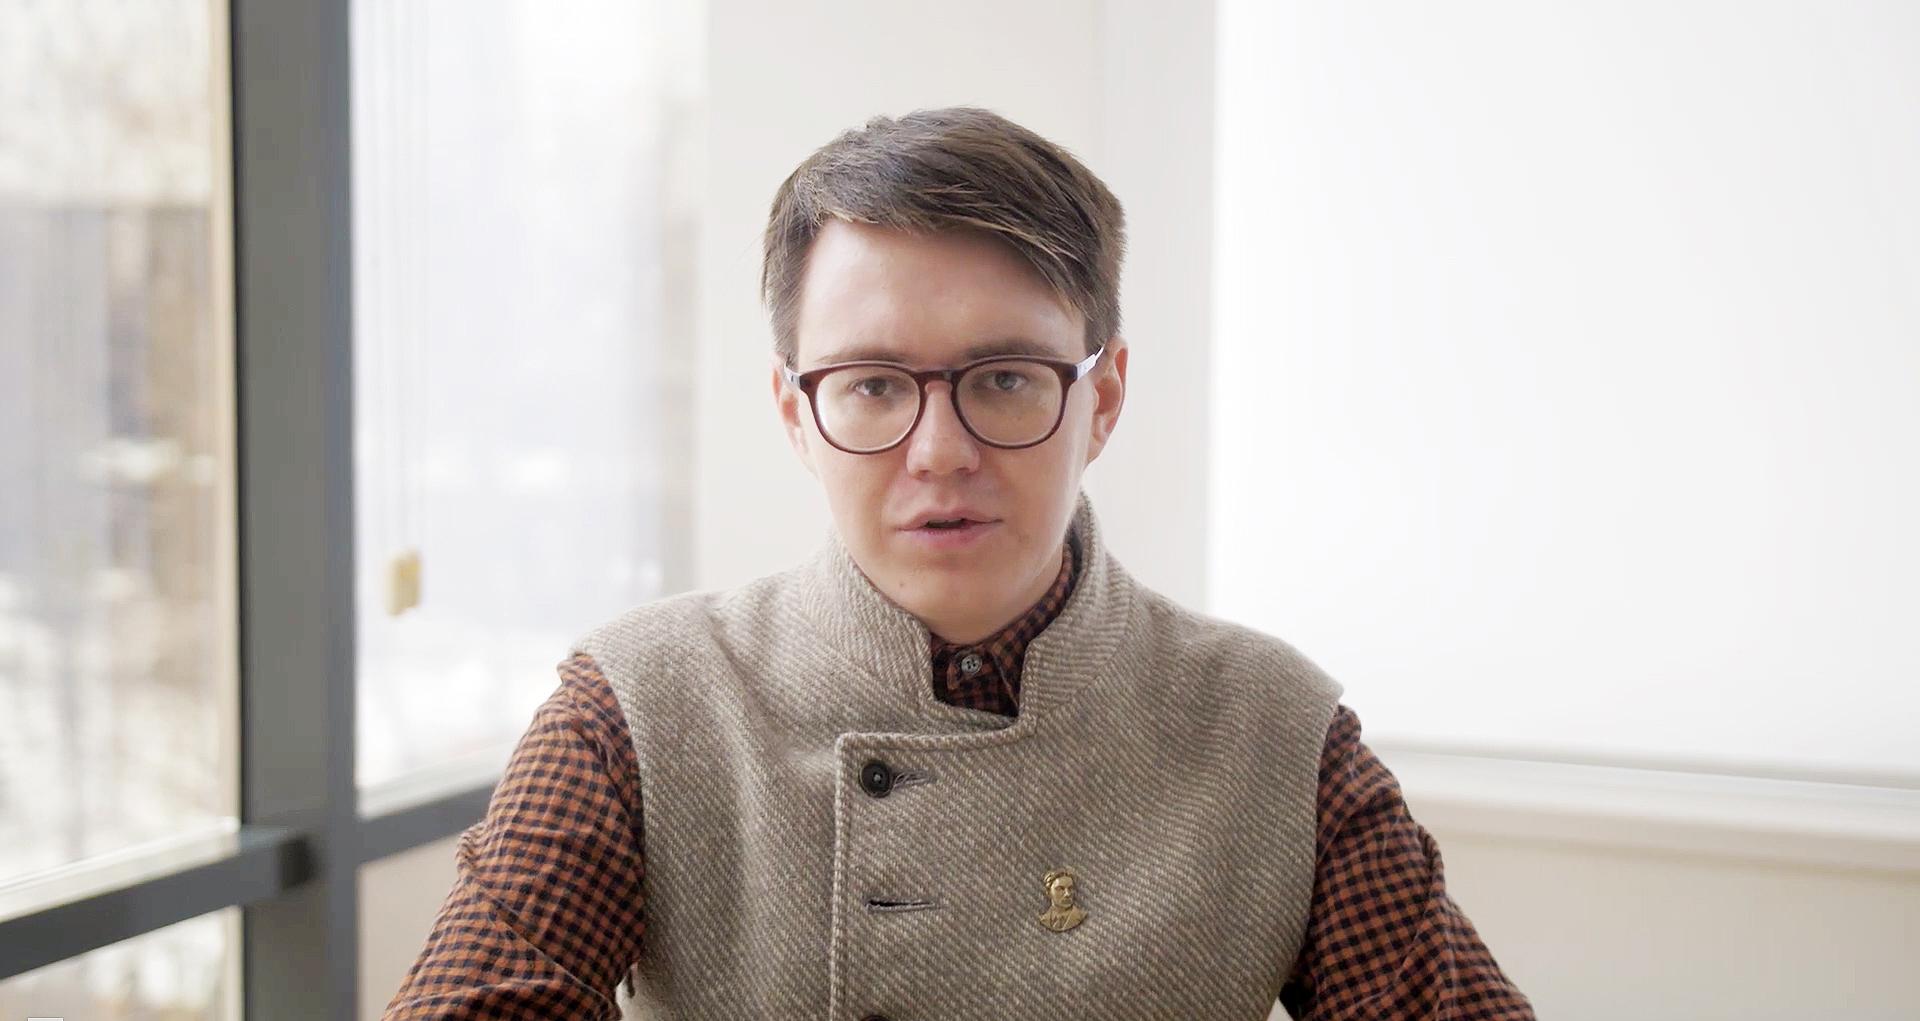 Павел Гнилорыбов